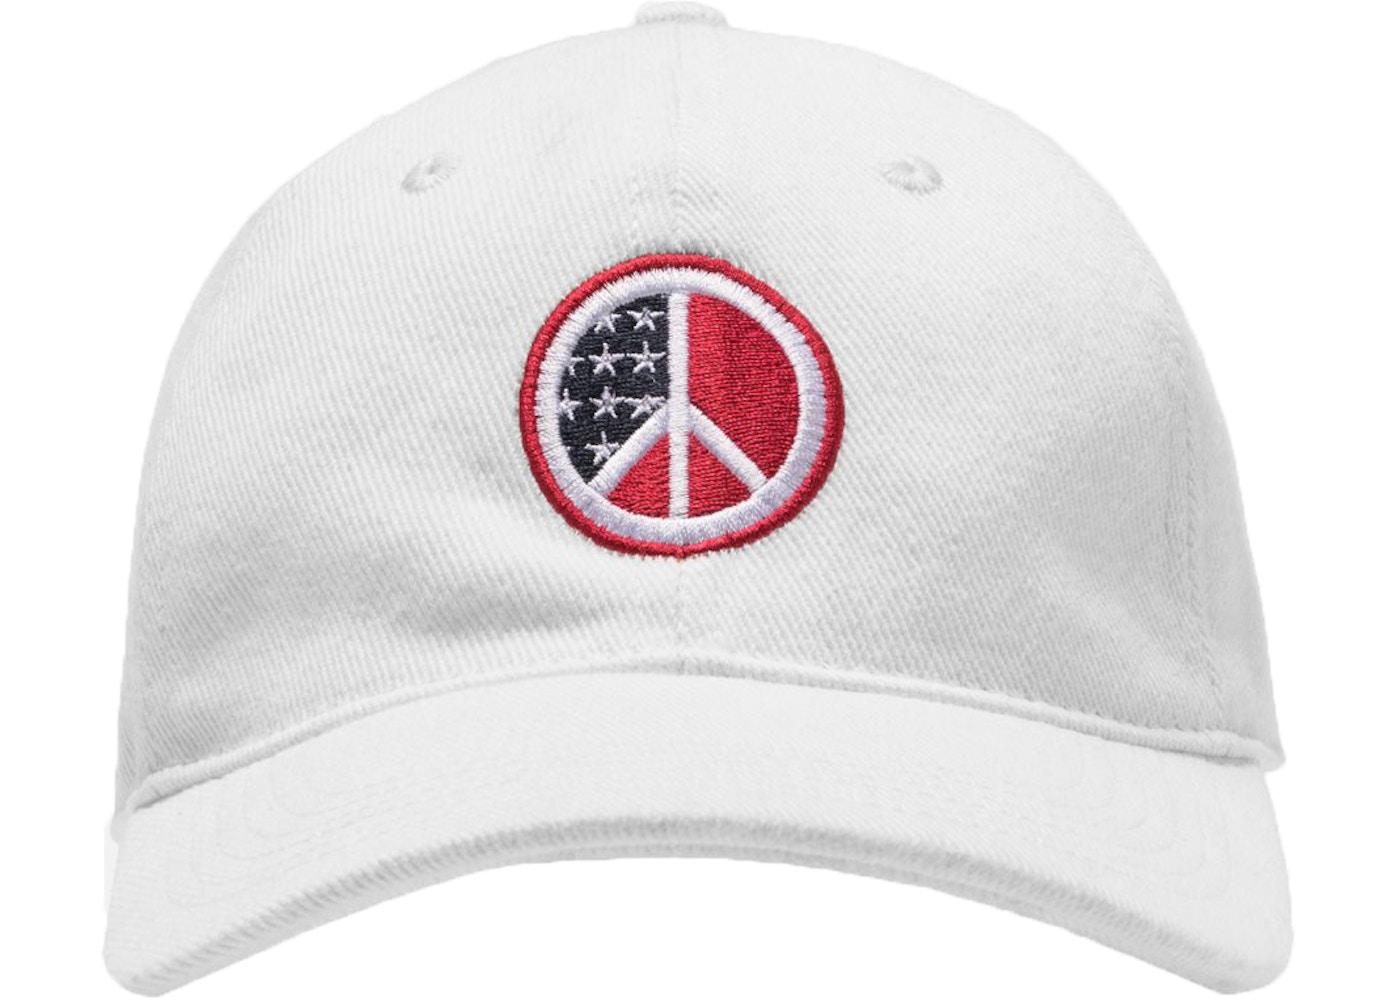 fac21900bb1 Kith Coca Cola Peace Cap White - SS17